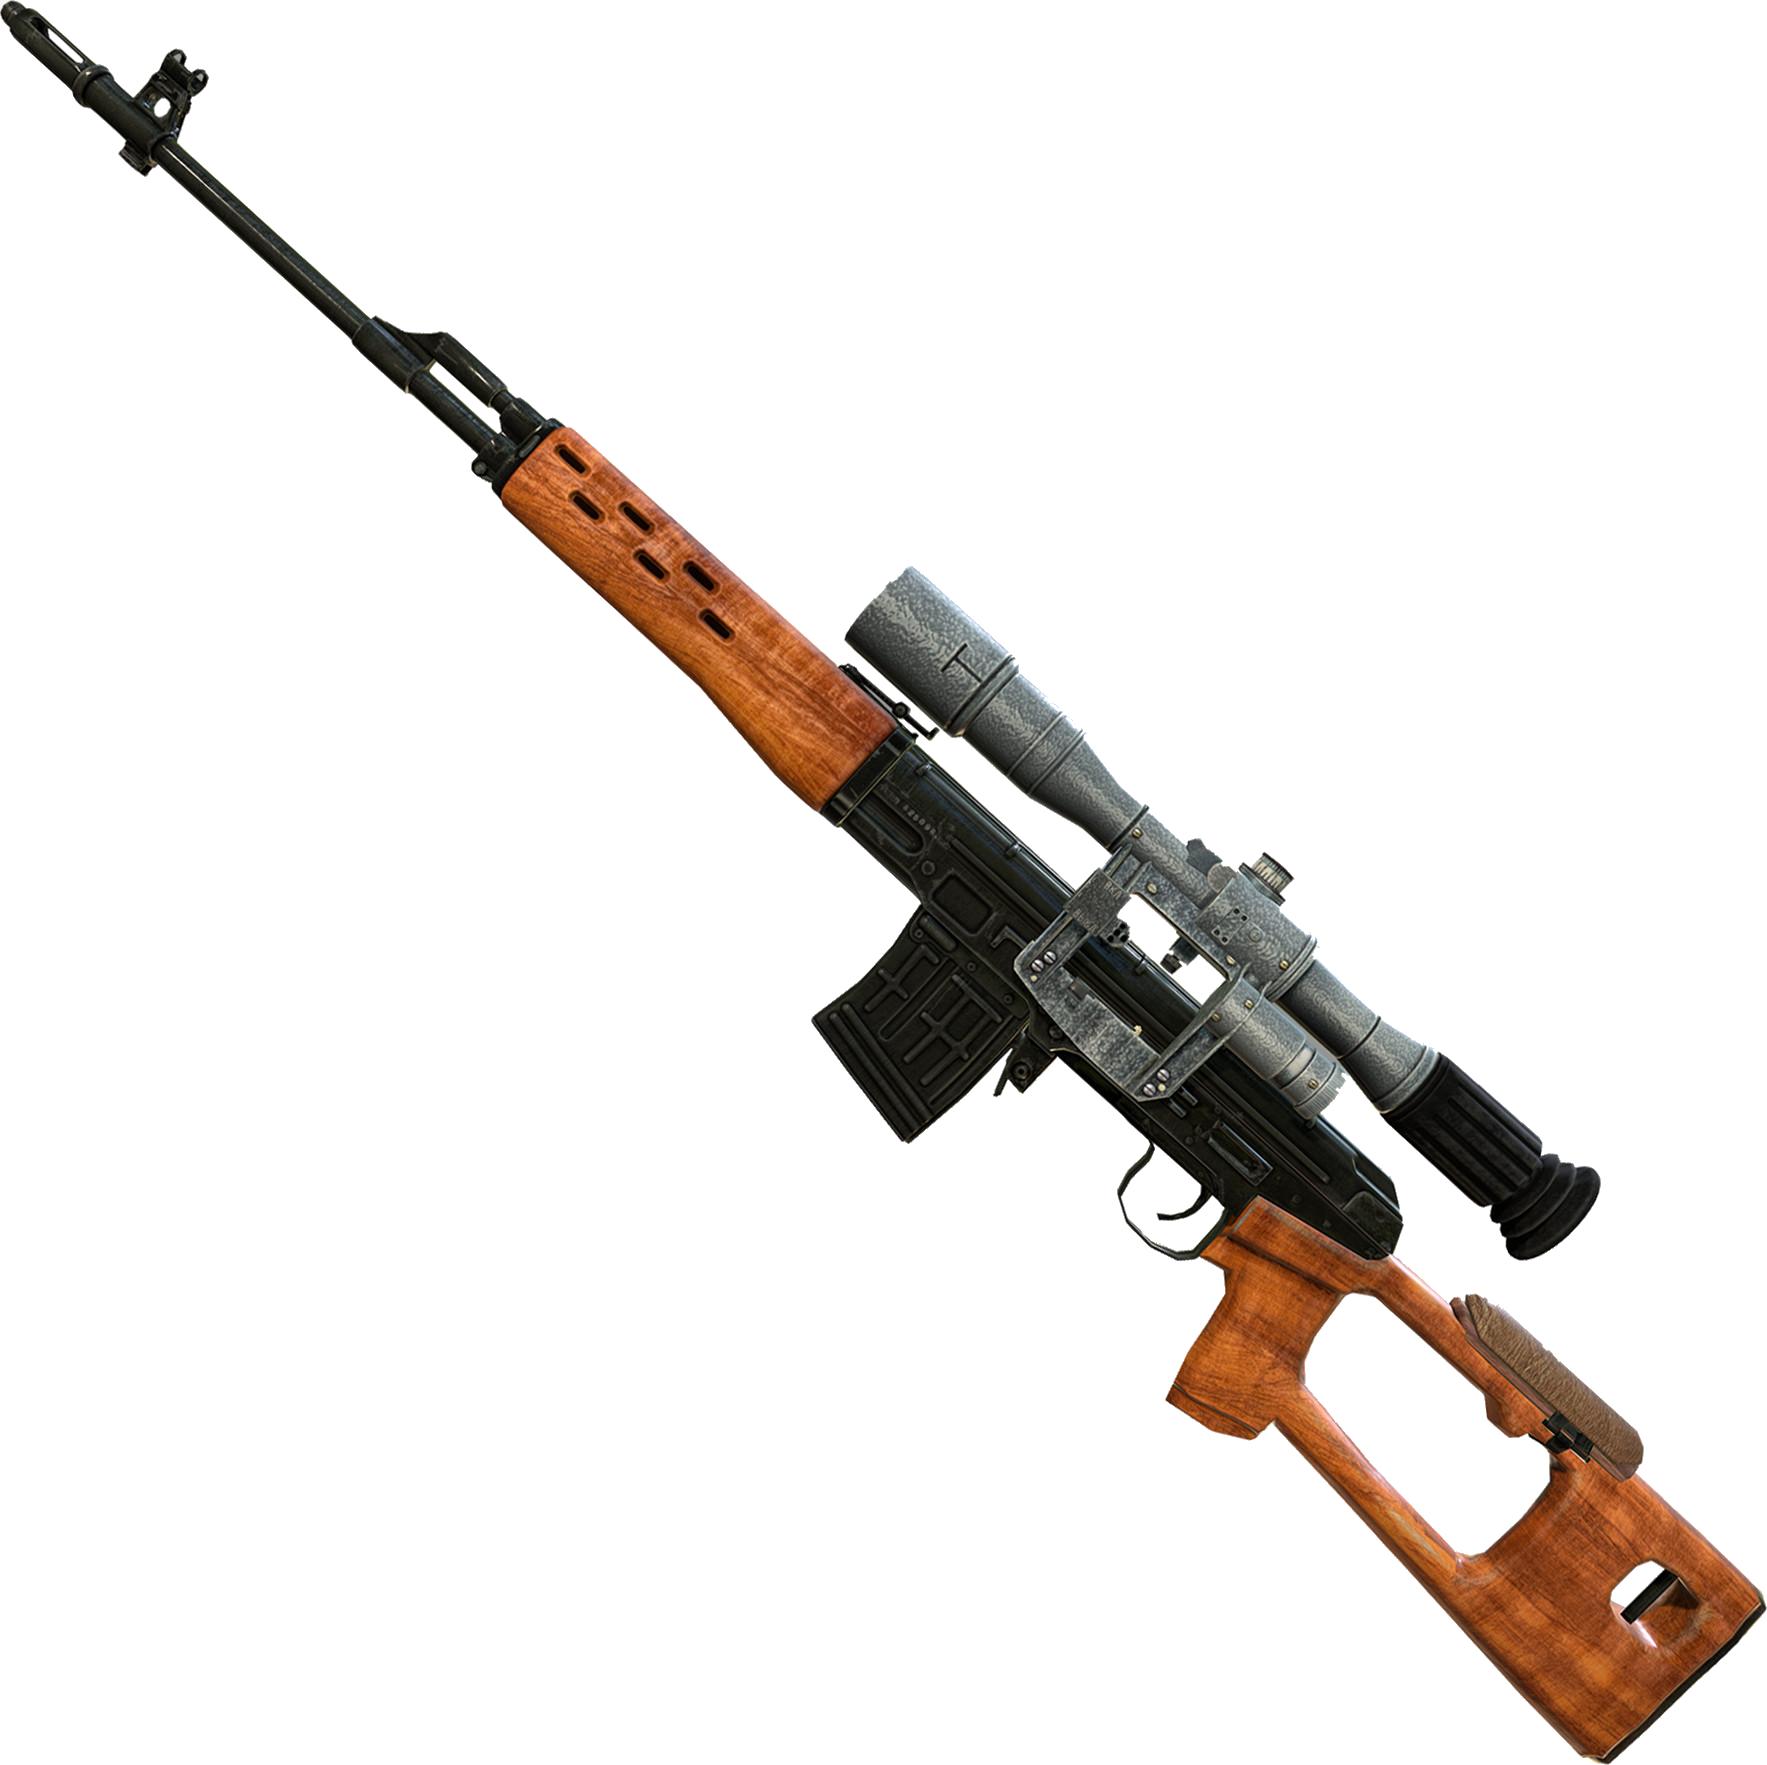 Wooden Sniper PNG Image.